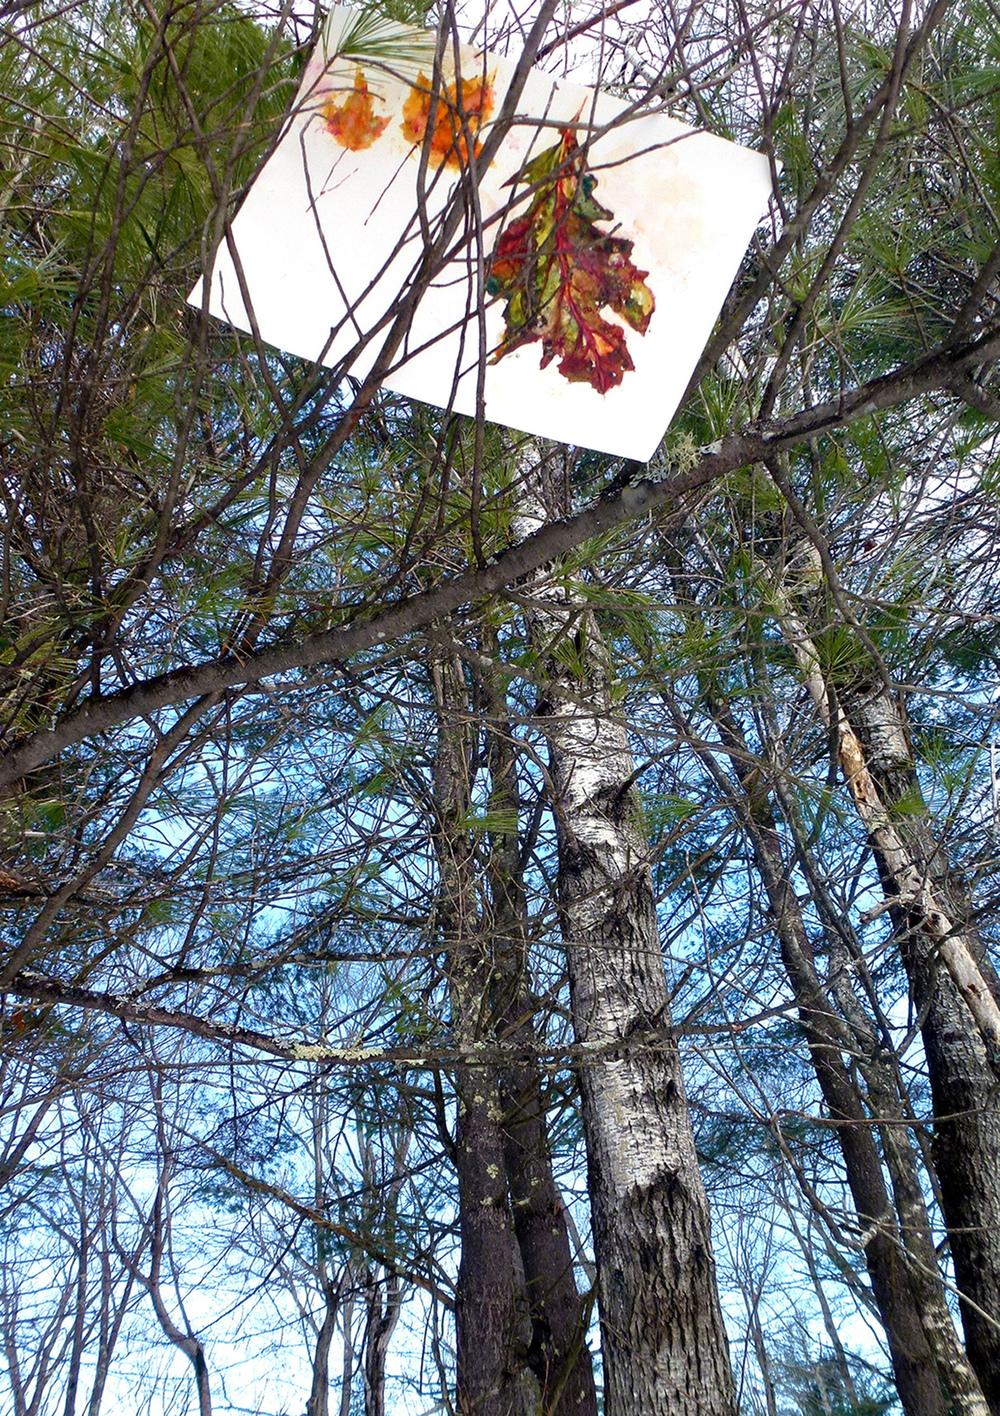 Diane_Fiedler_LeafPaintTrees_sm.jpg